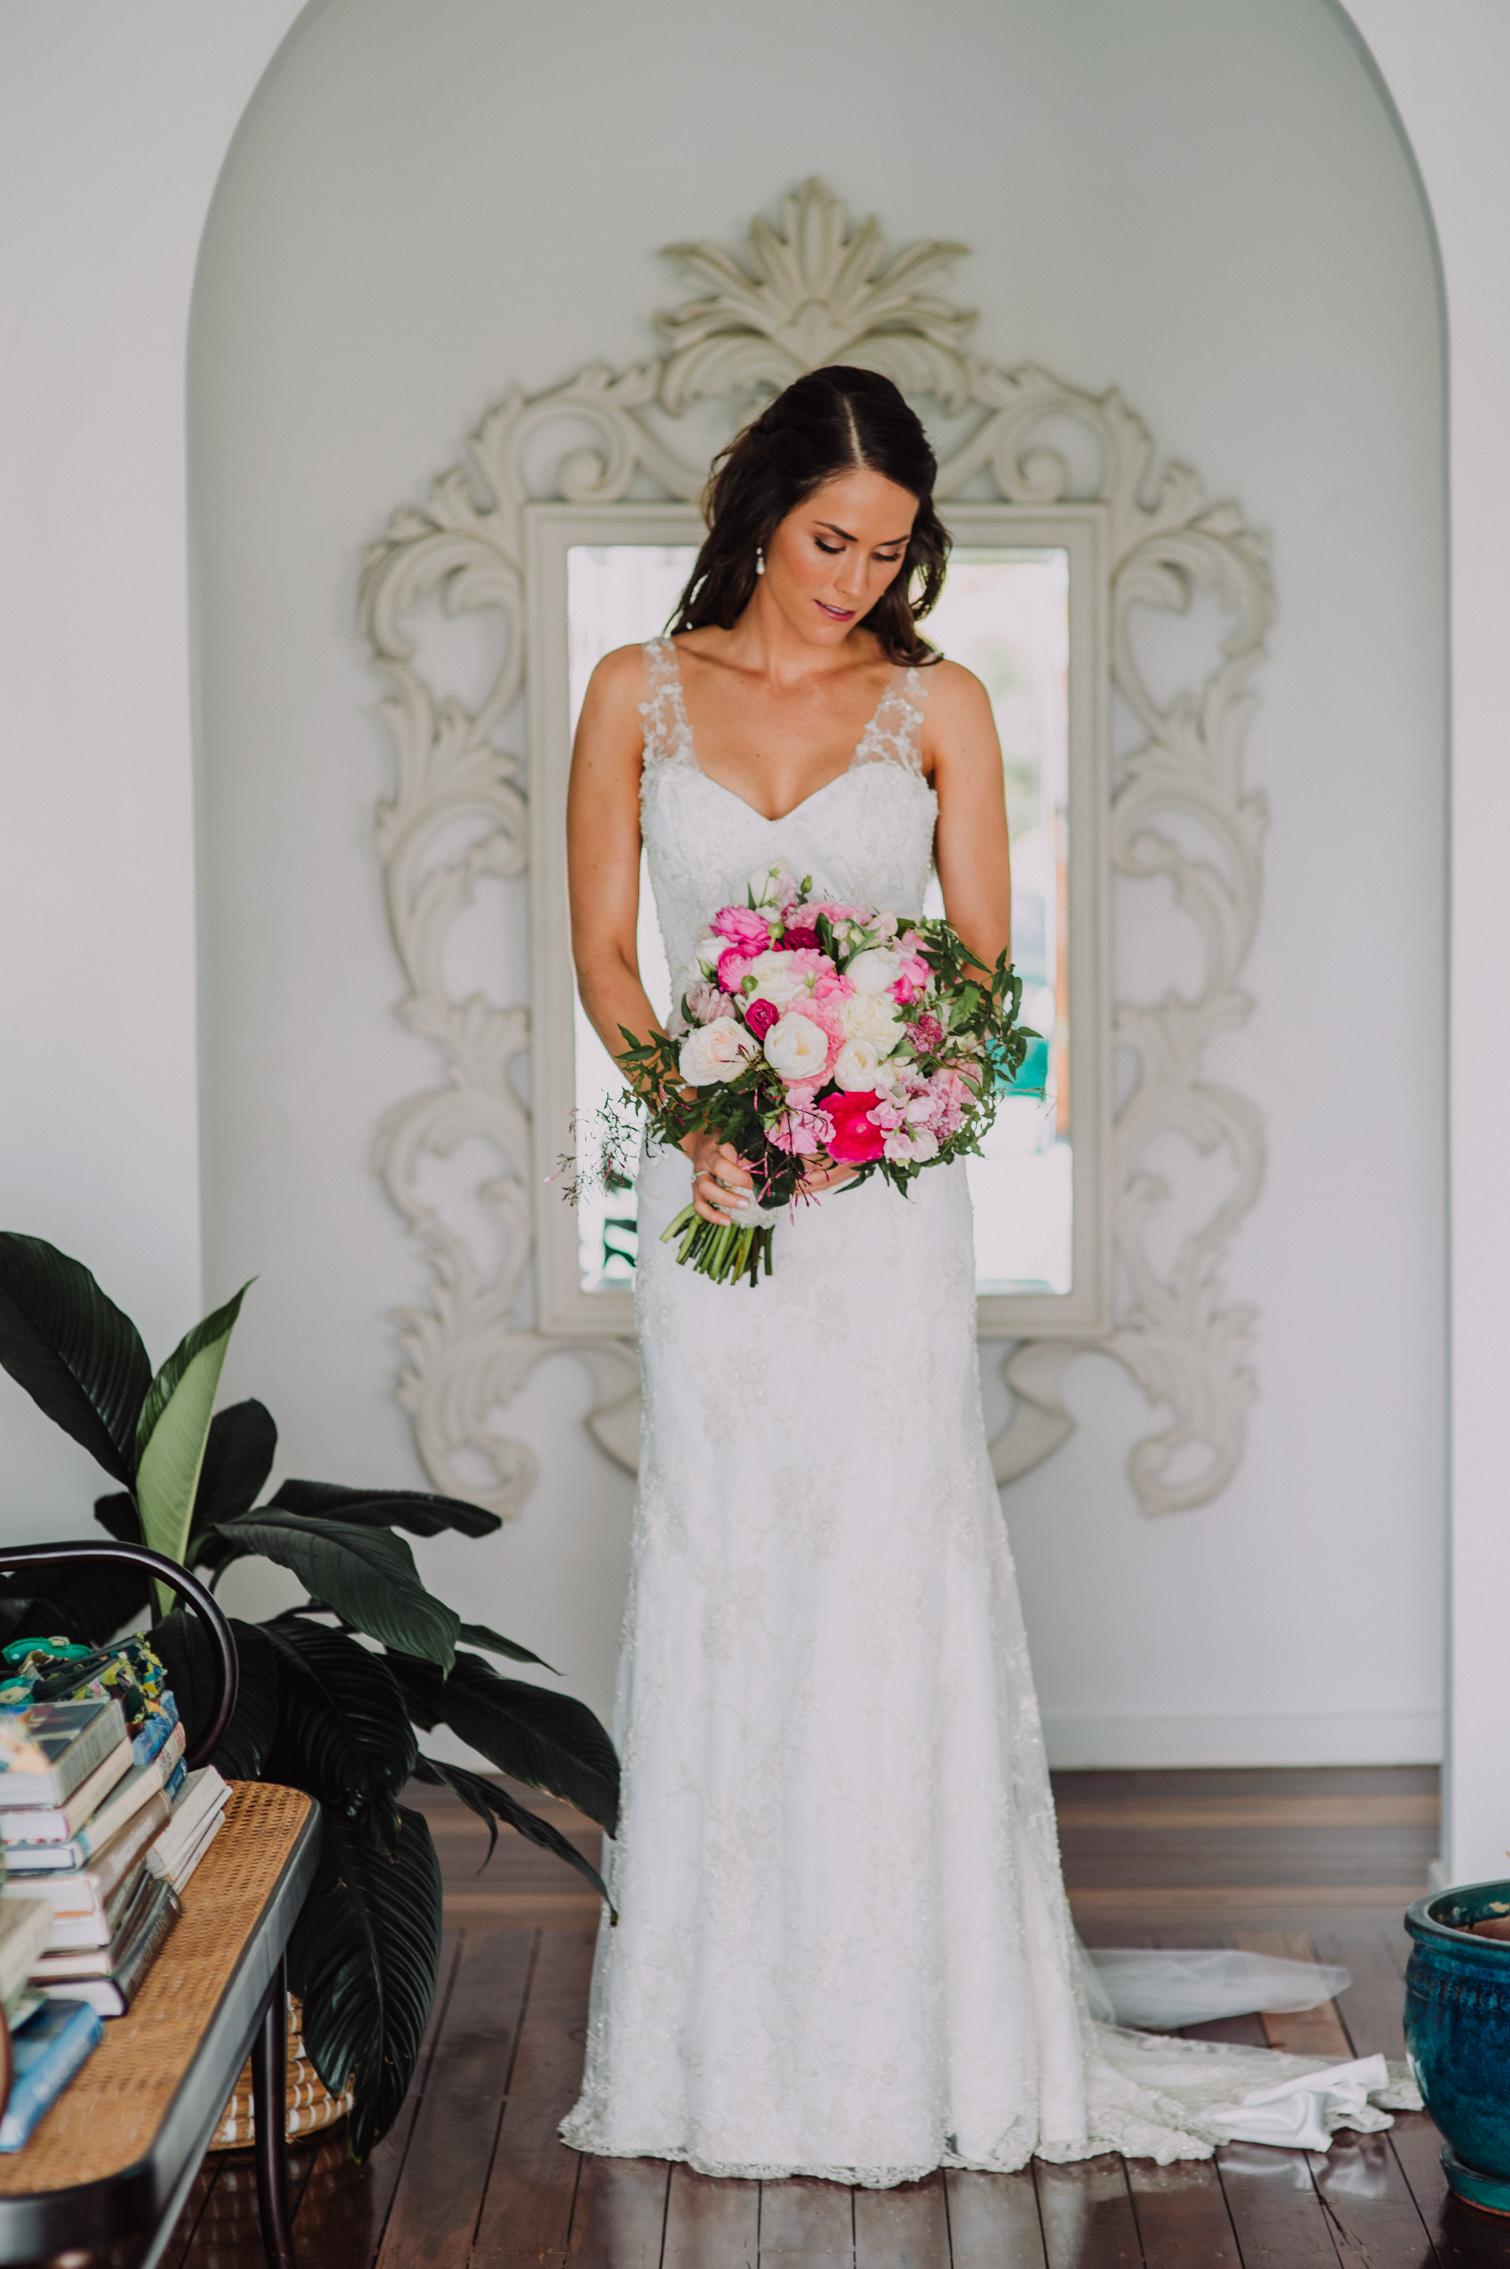 The_French_Petal_Wedding-Florist-2.jpg